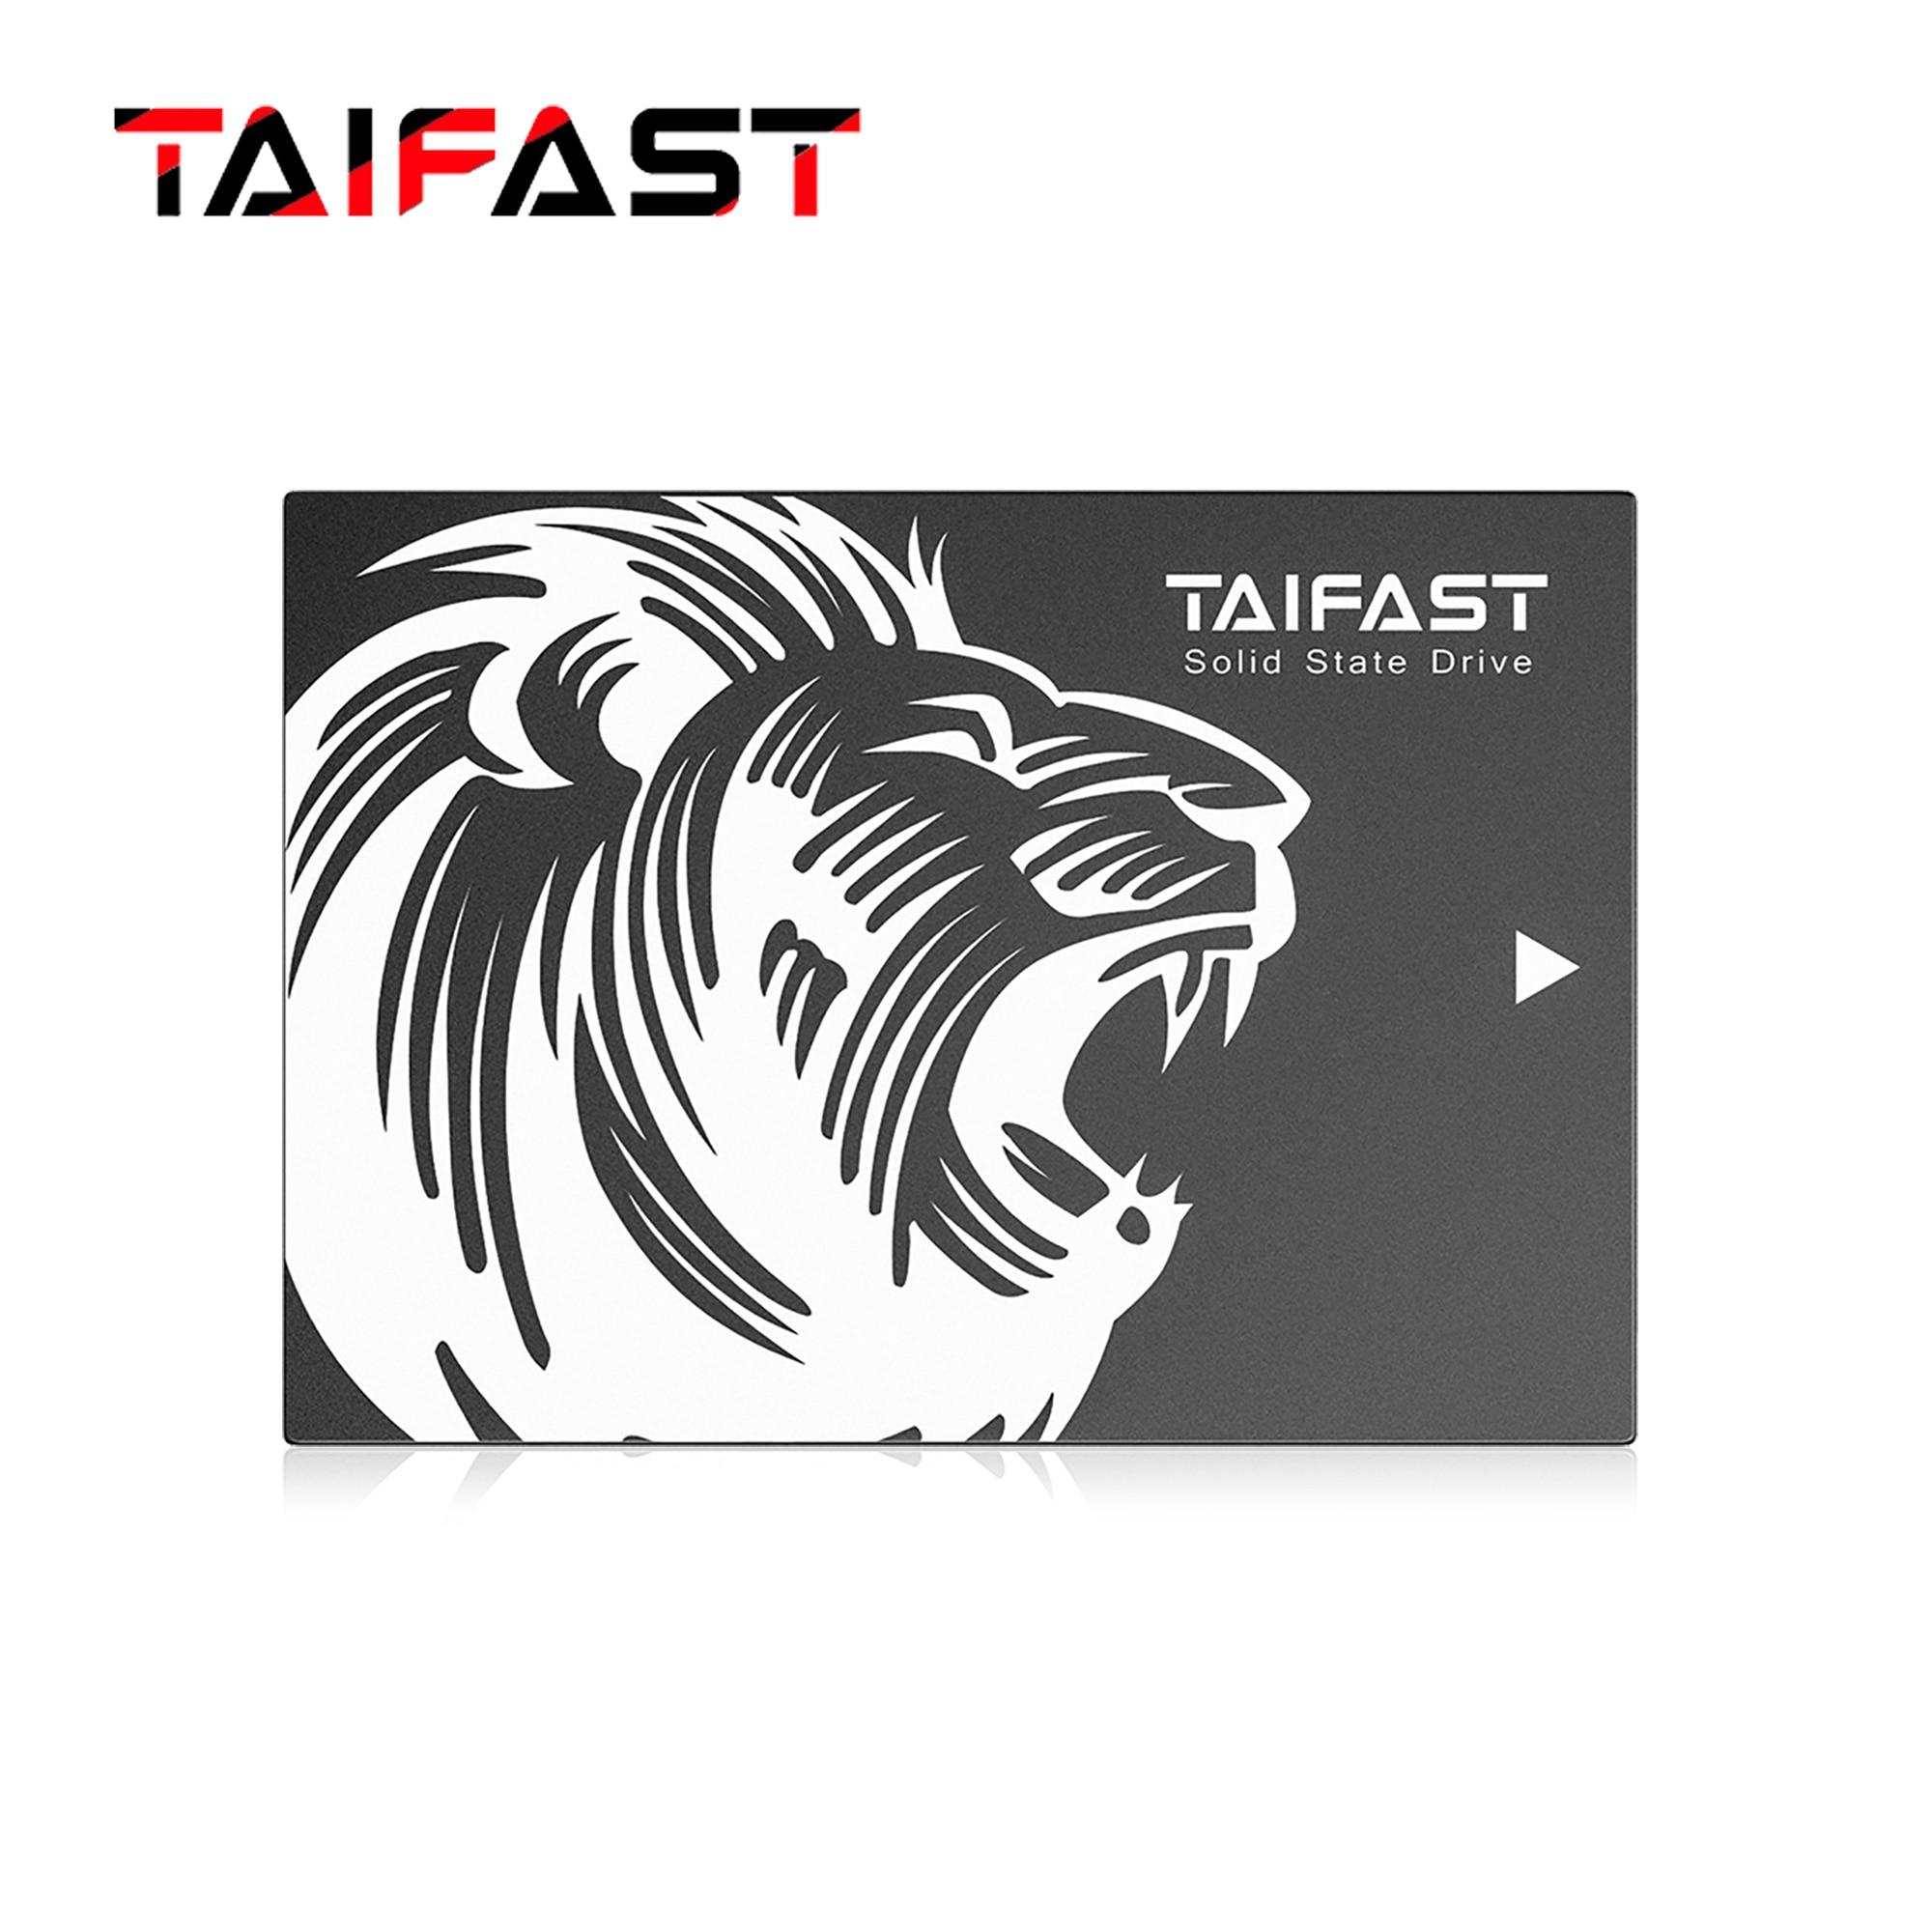 Taifast SSD жесткого диска sata hdd 2,5 1 ТБ hd 1 ТБ 500 Гб 128 ГБ HDD 512 ГБ 120 240 256 ГБ 2 ТБ disco duro жесткий диск sata 3 для ноутбук компьютер ПК